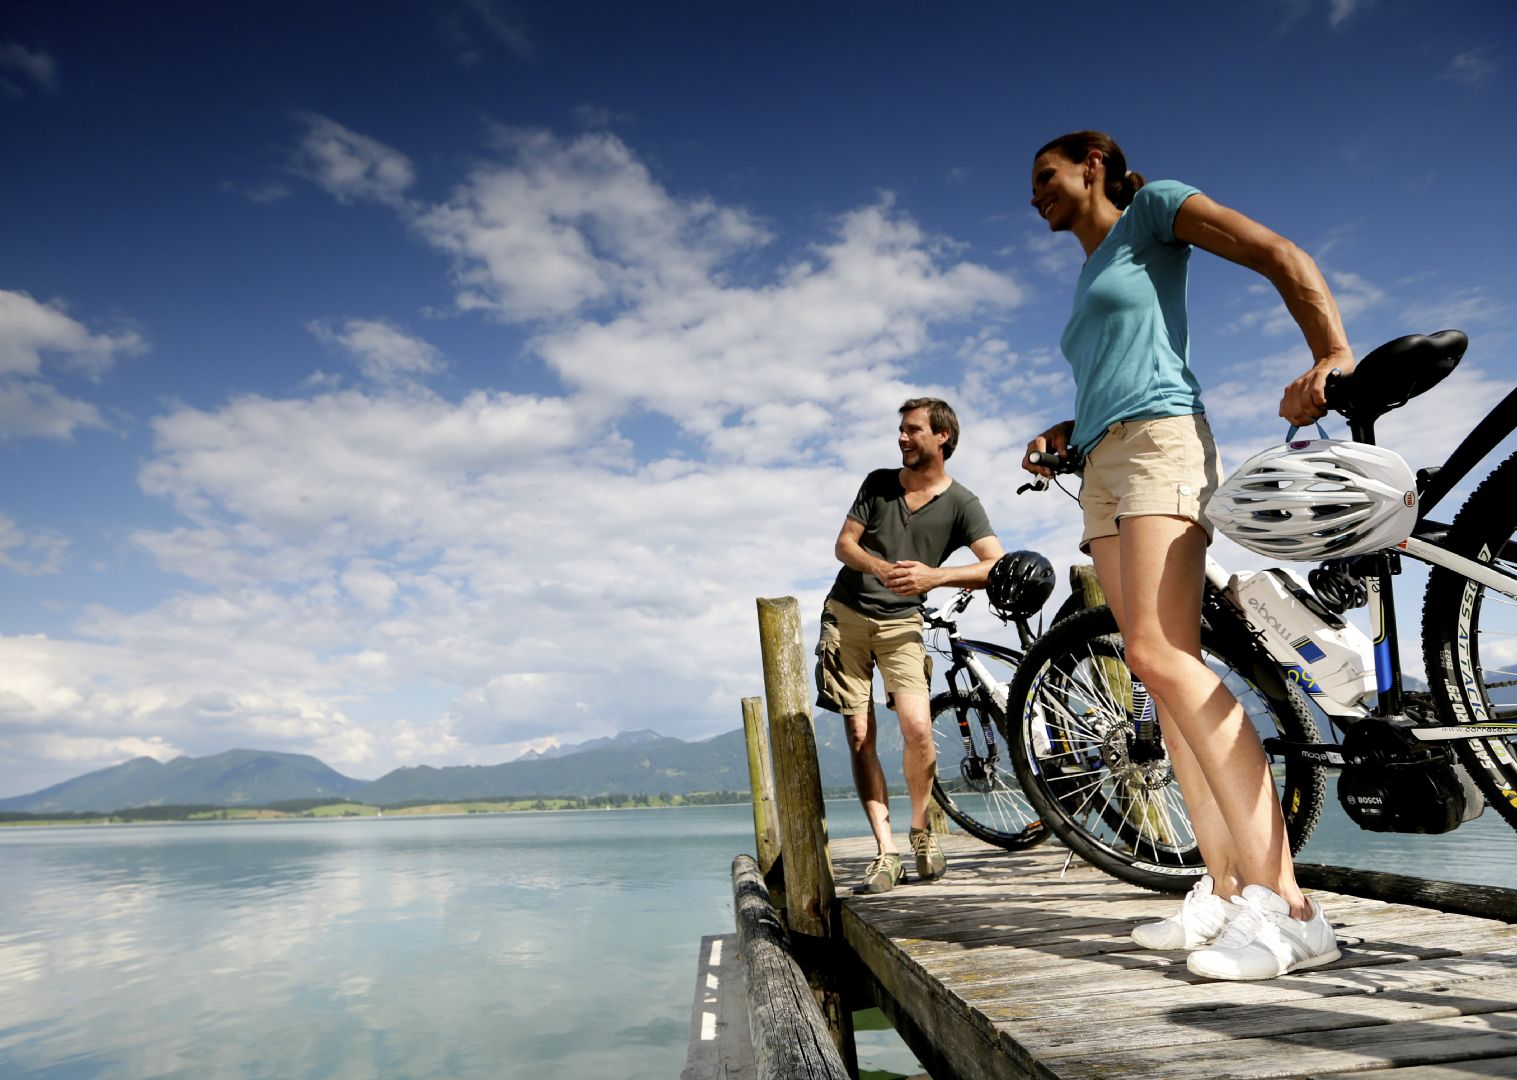 leisurecyclingbavaria4.jpg - Germany - Bavarian Lakes - Self-Guided Leisure Cycling Holiday - Leisure Cycling